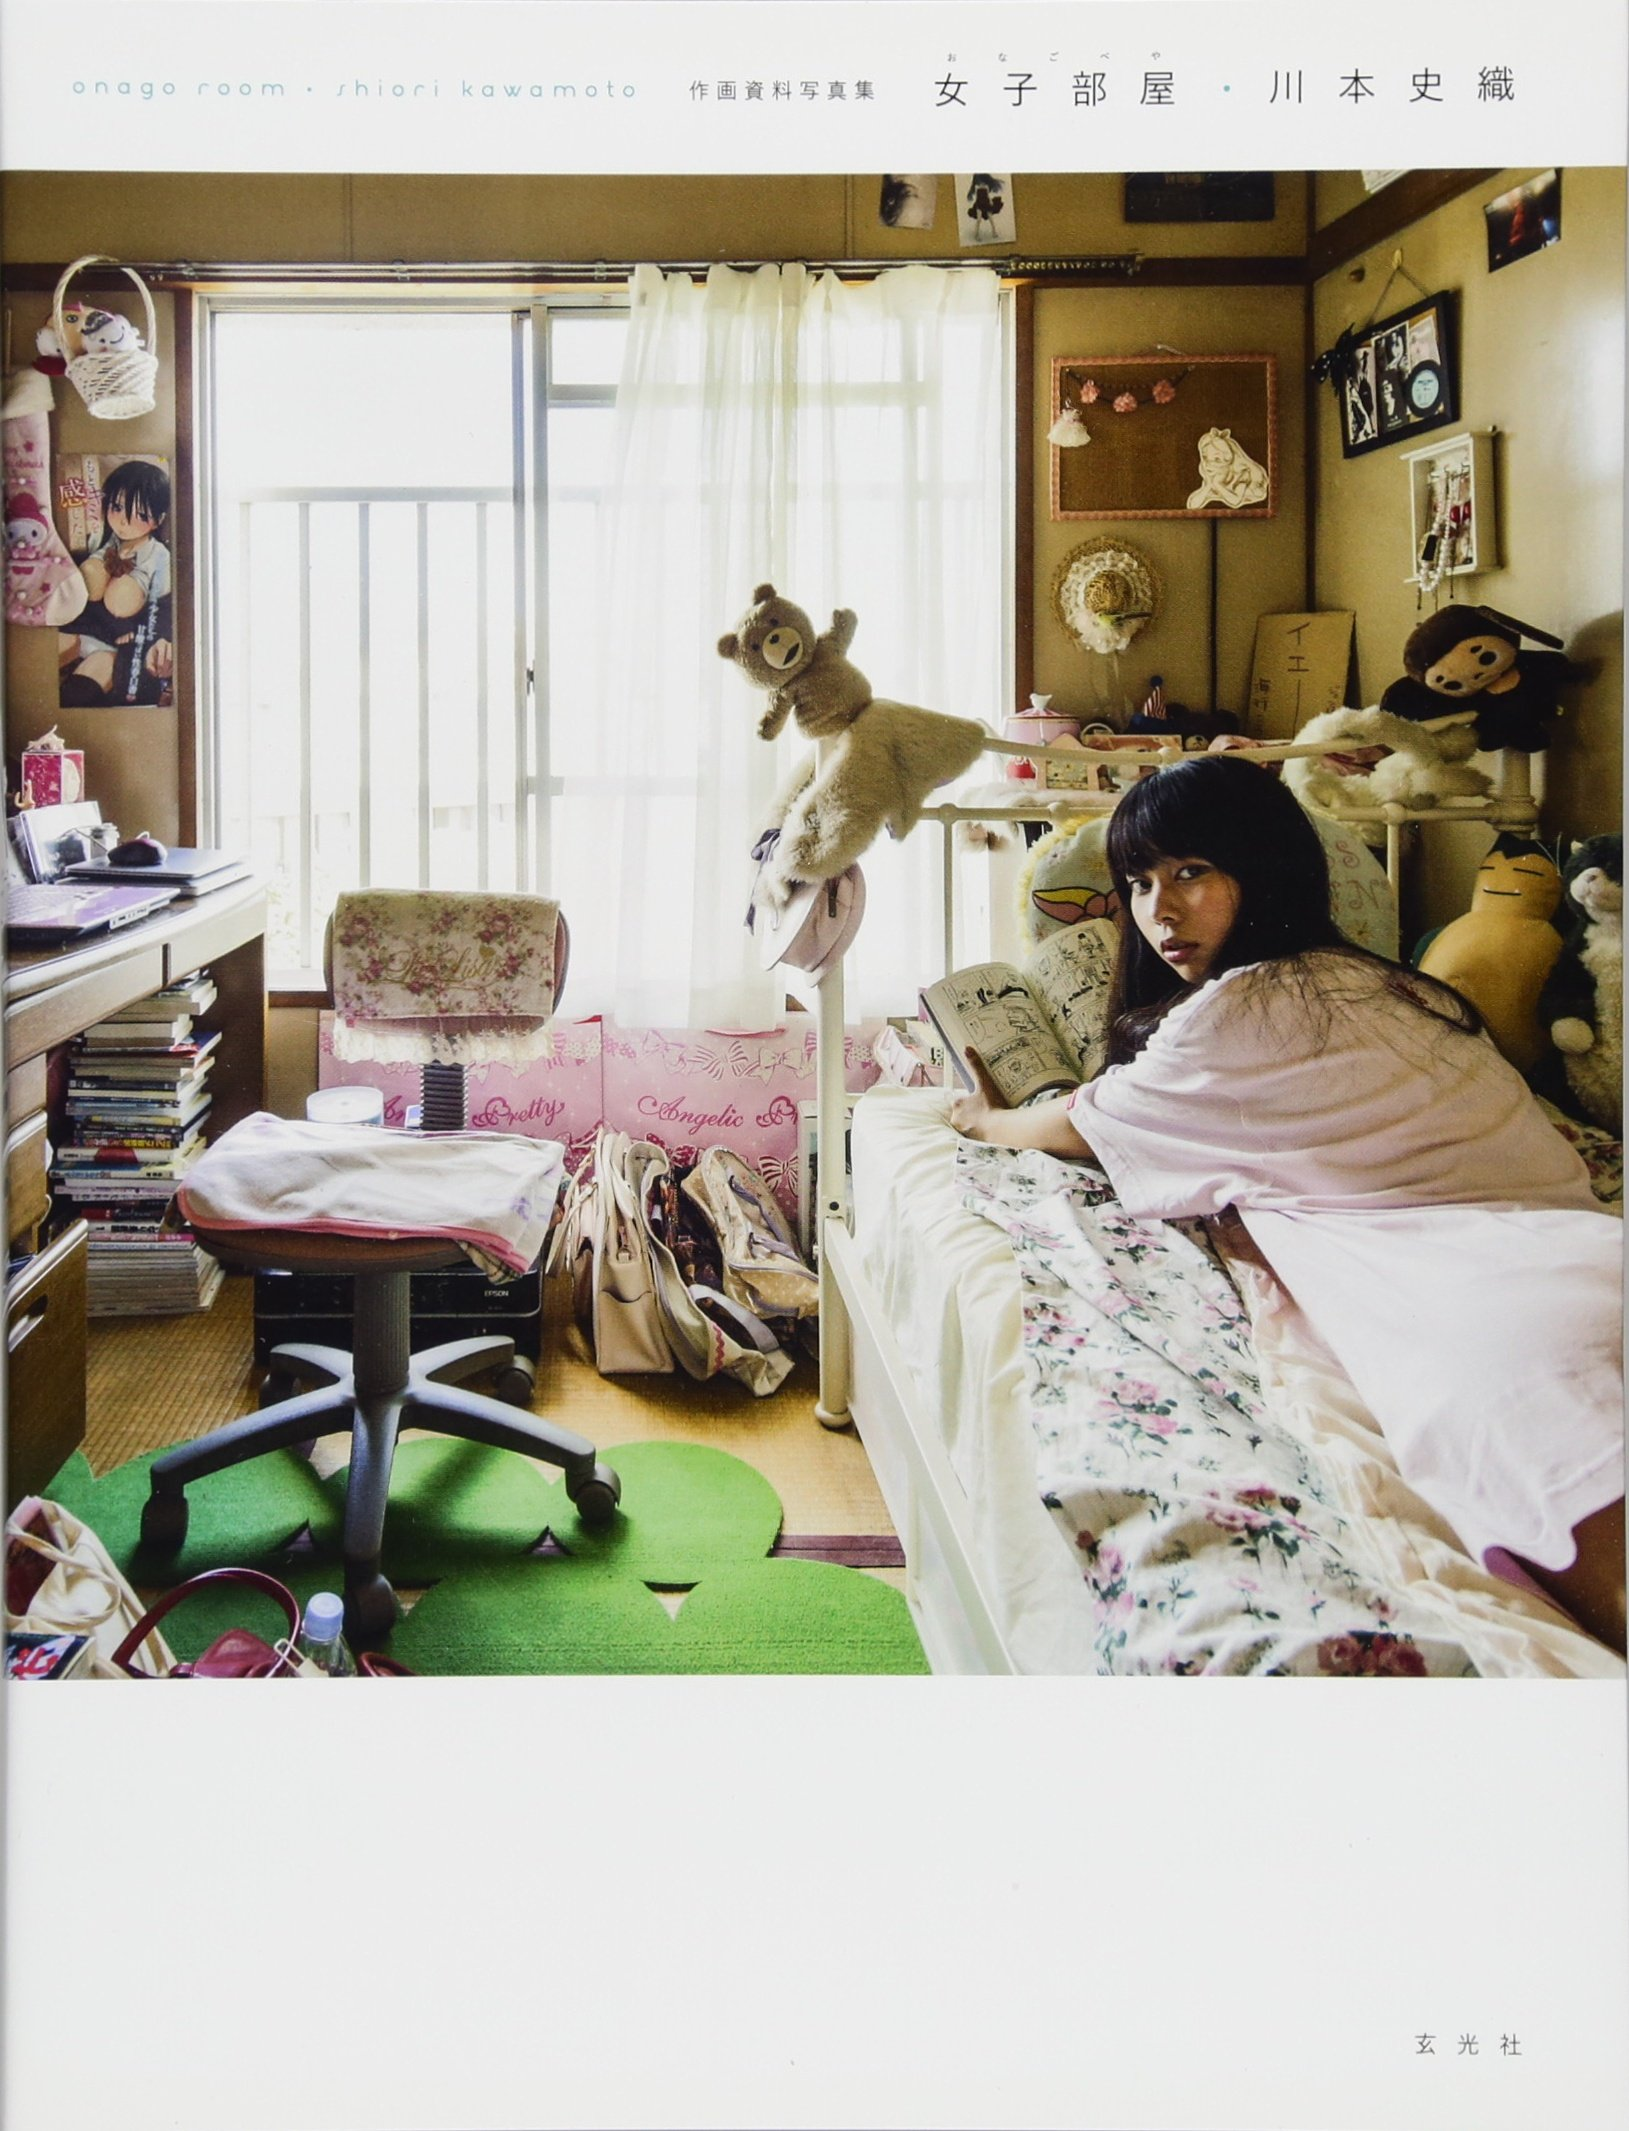 japanese women in bed